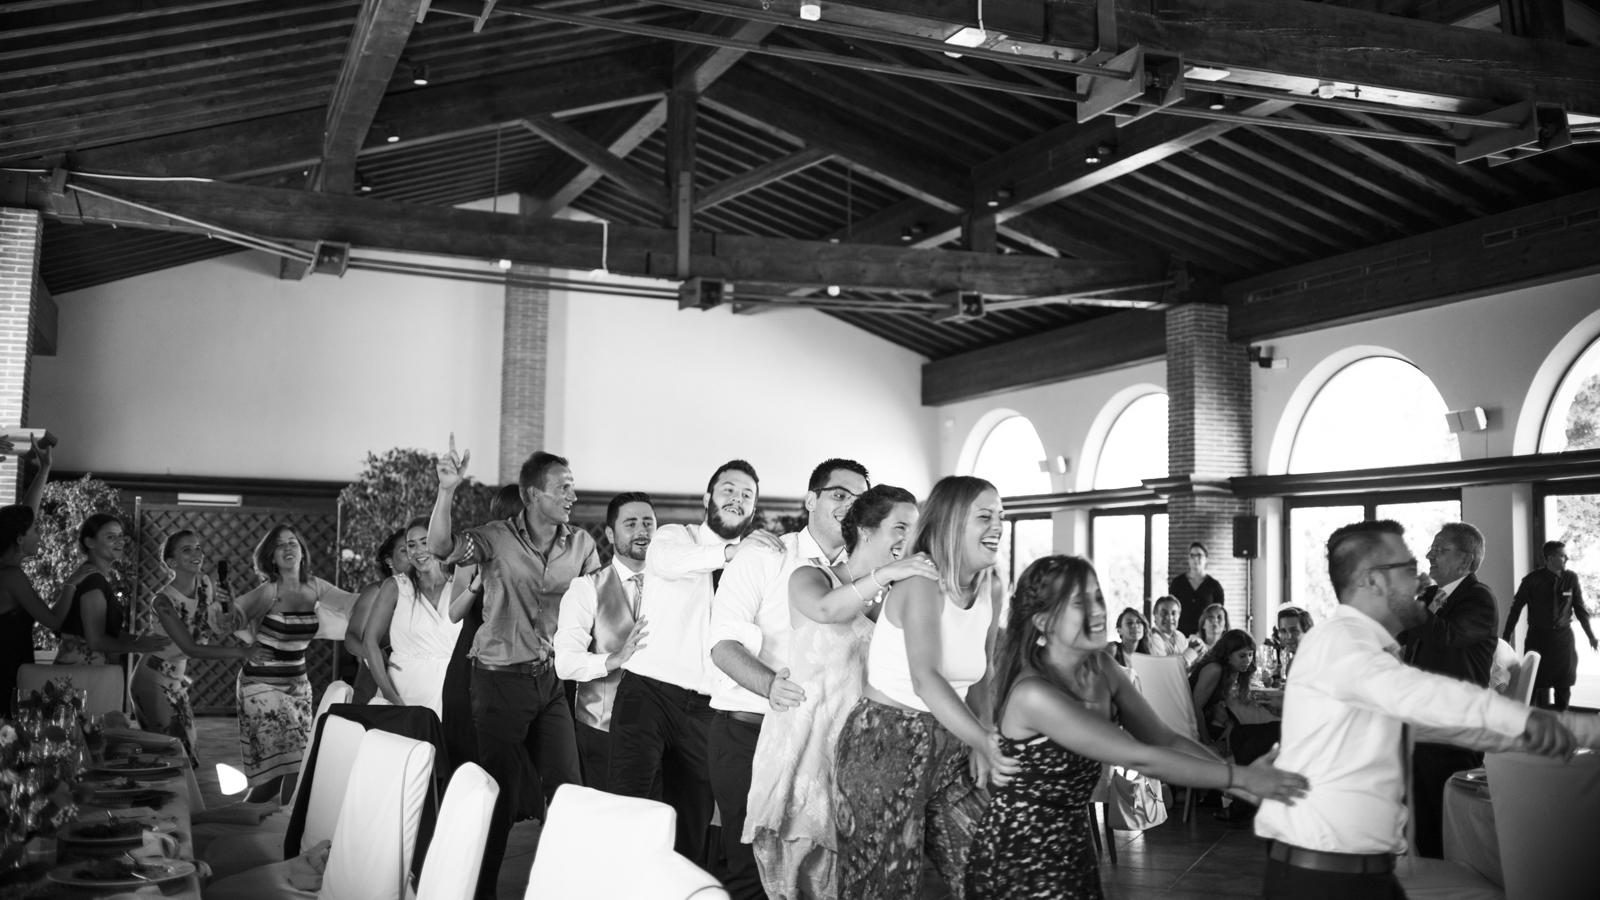 mia-moments-photo-boda-terrassa-mas-bonvilar-fotografia-169.jpg